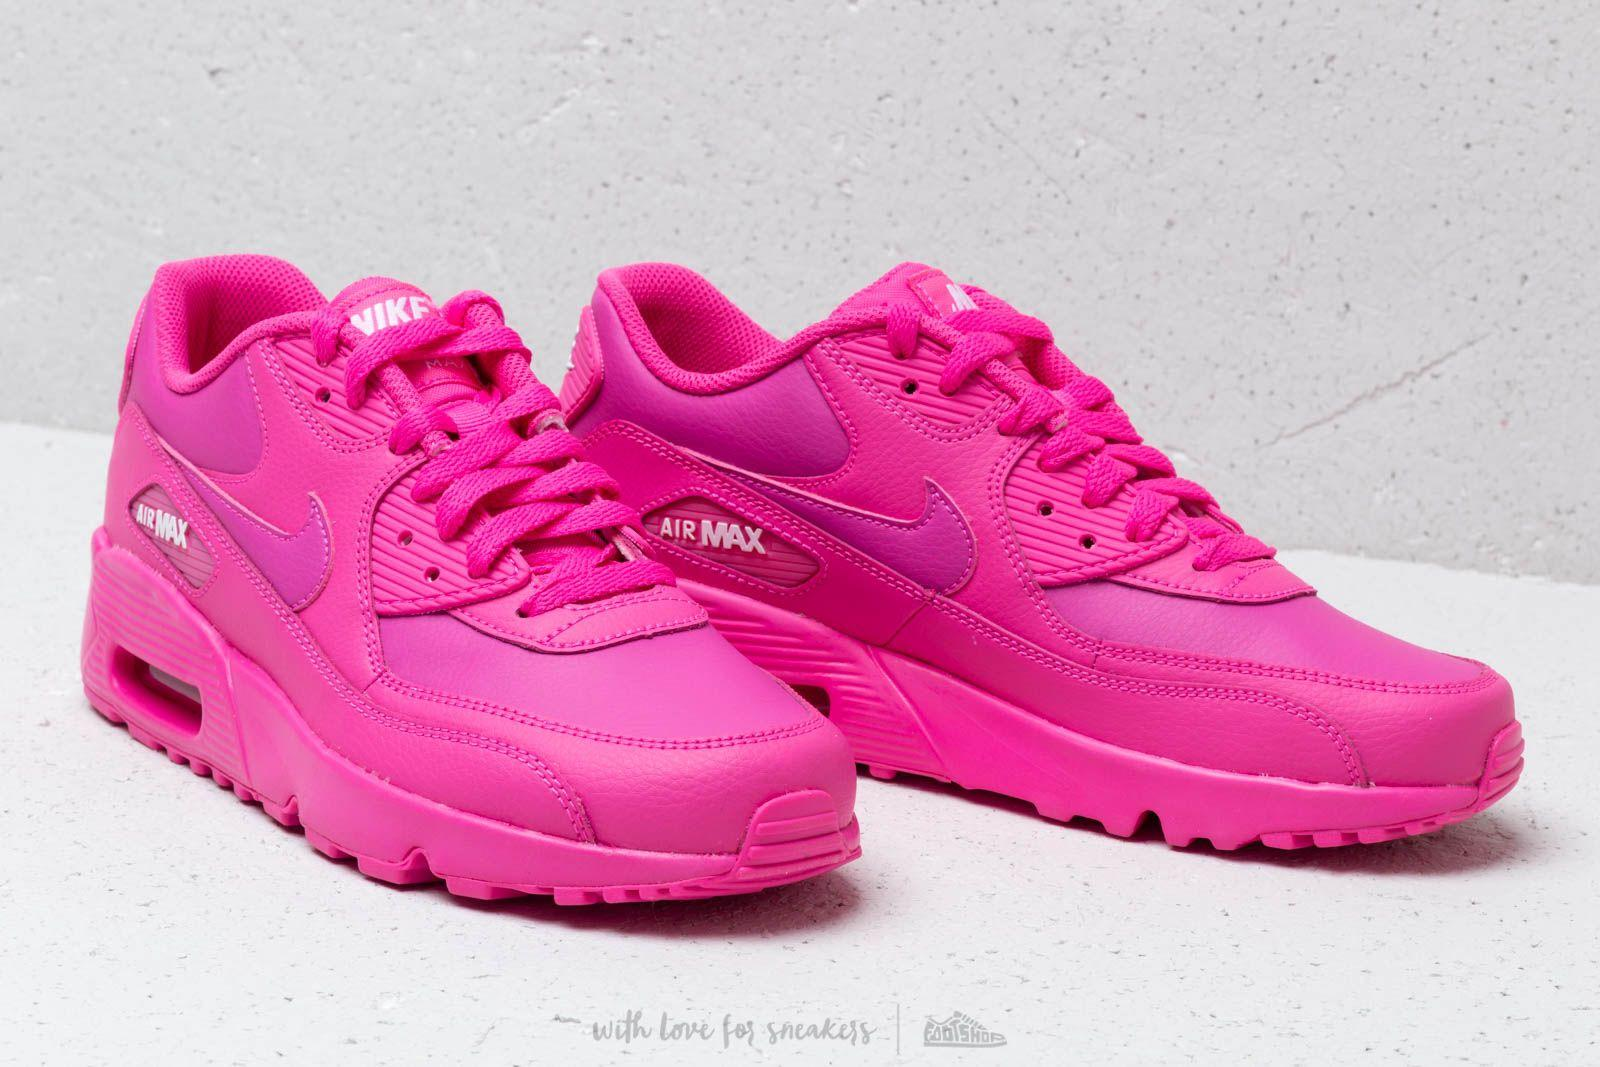 Nike Leather Air Max 90 Ltr (gs) Laser Fuchsia/ Laser Fuchsia ...